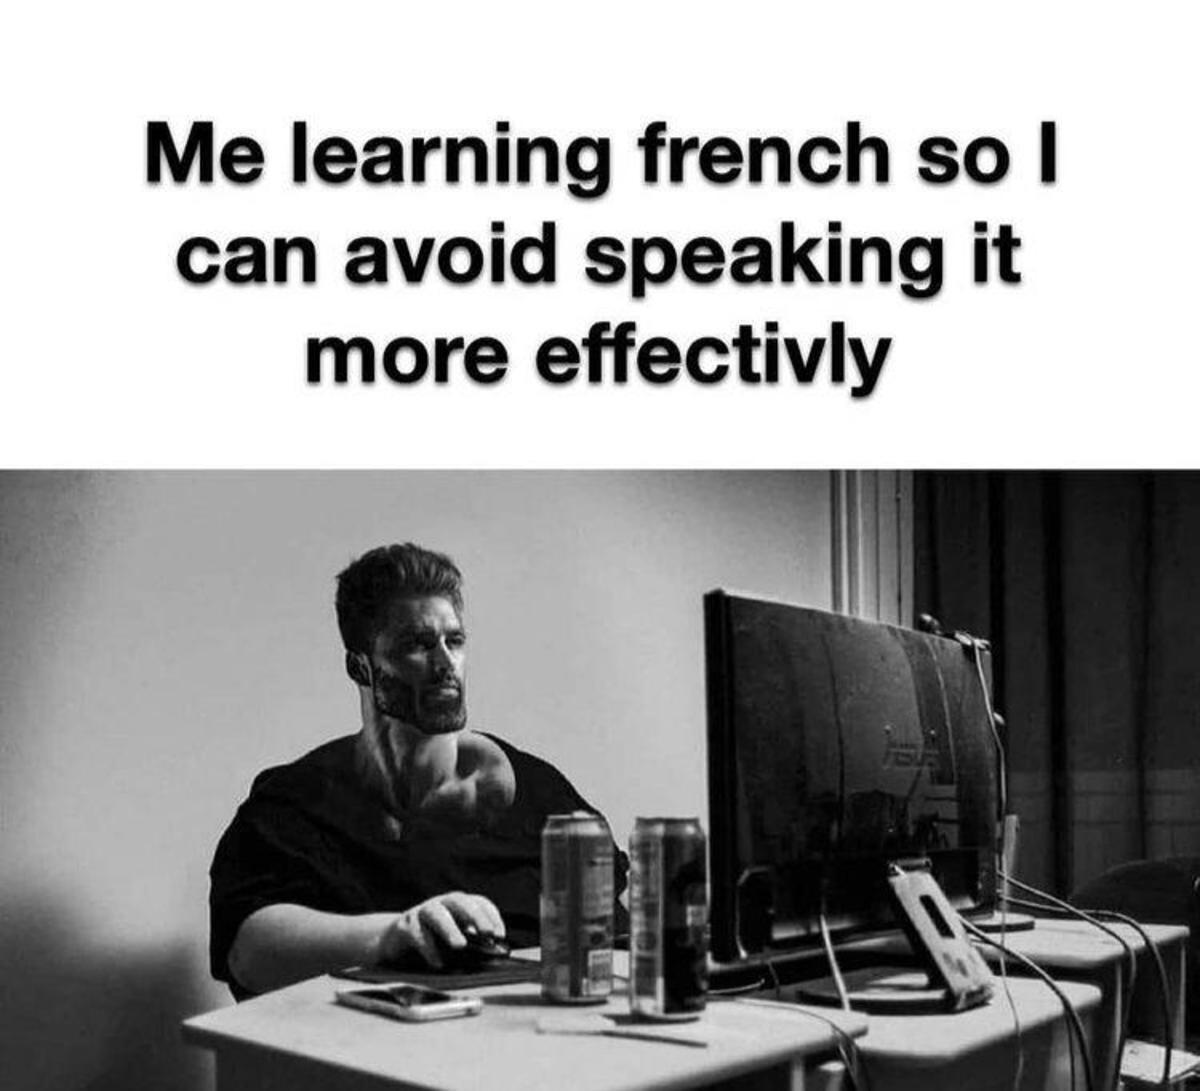 envious Chamois. .. I learned English to read memes.